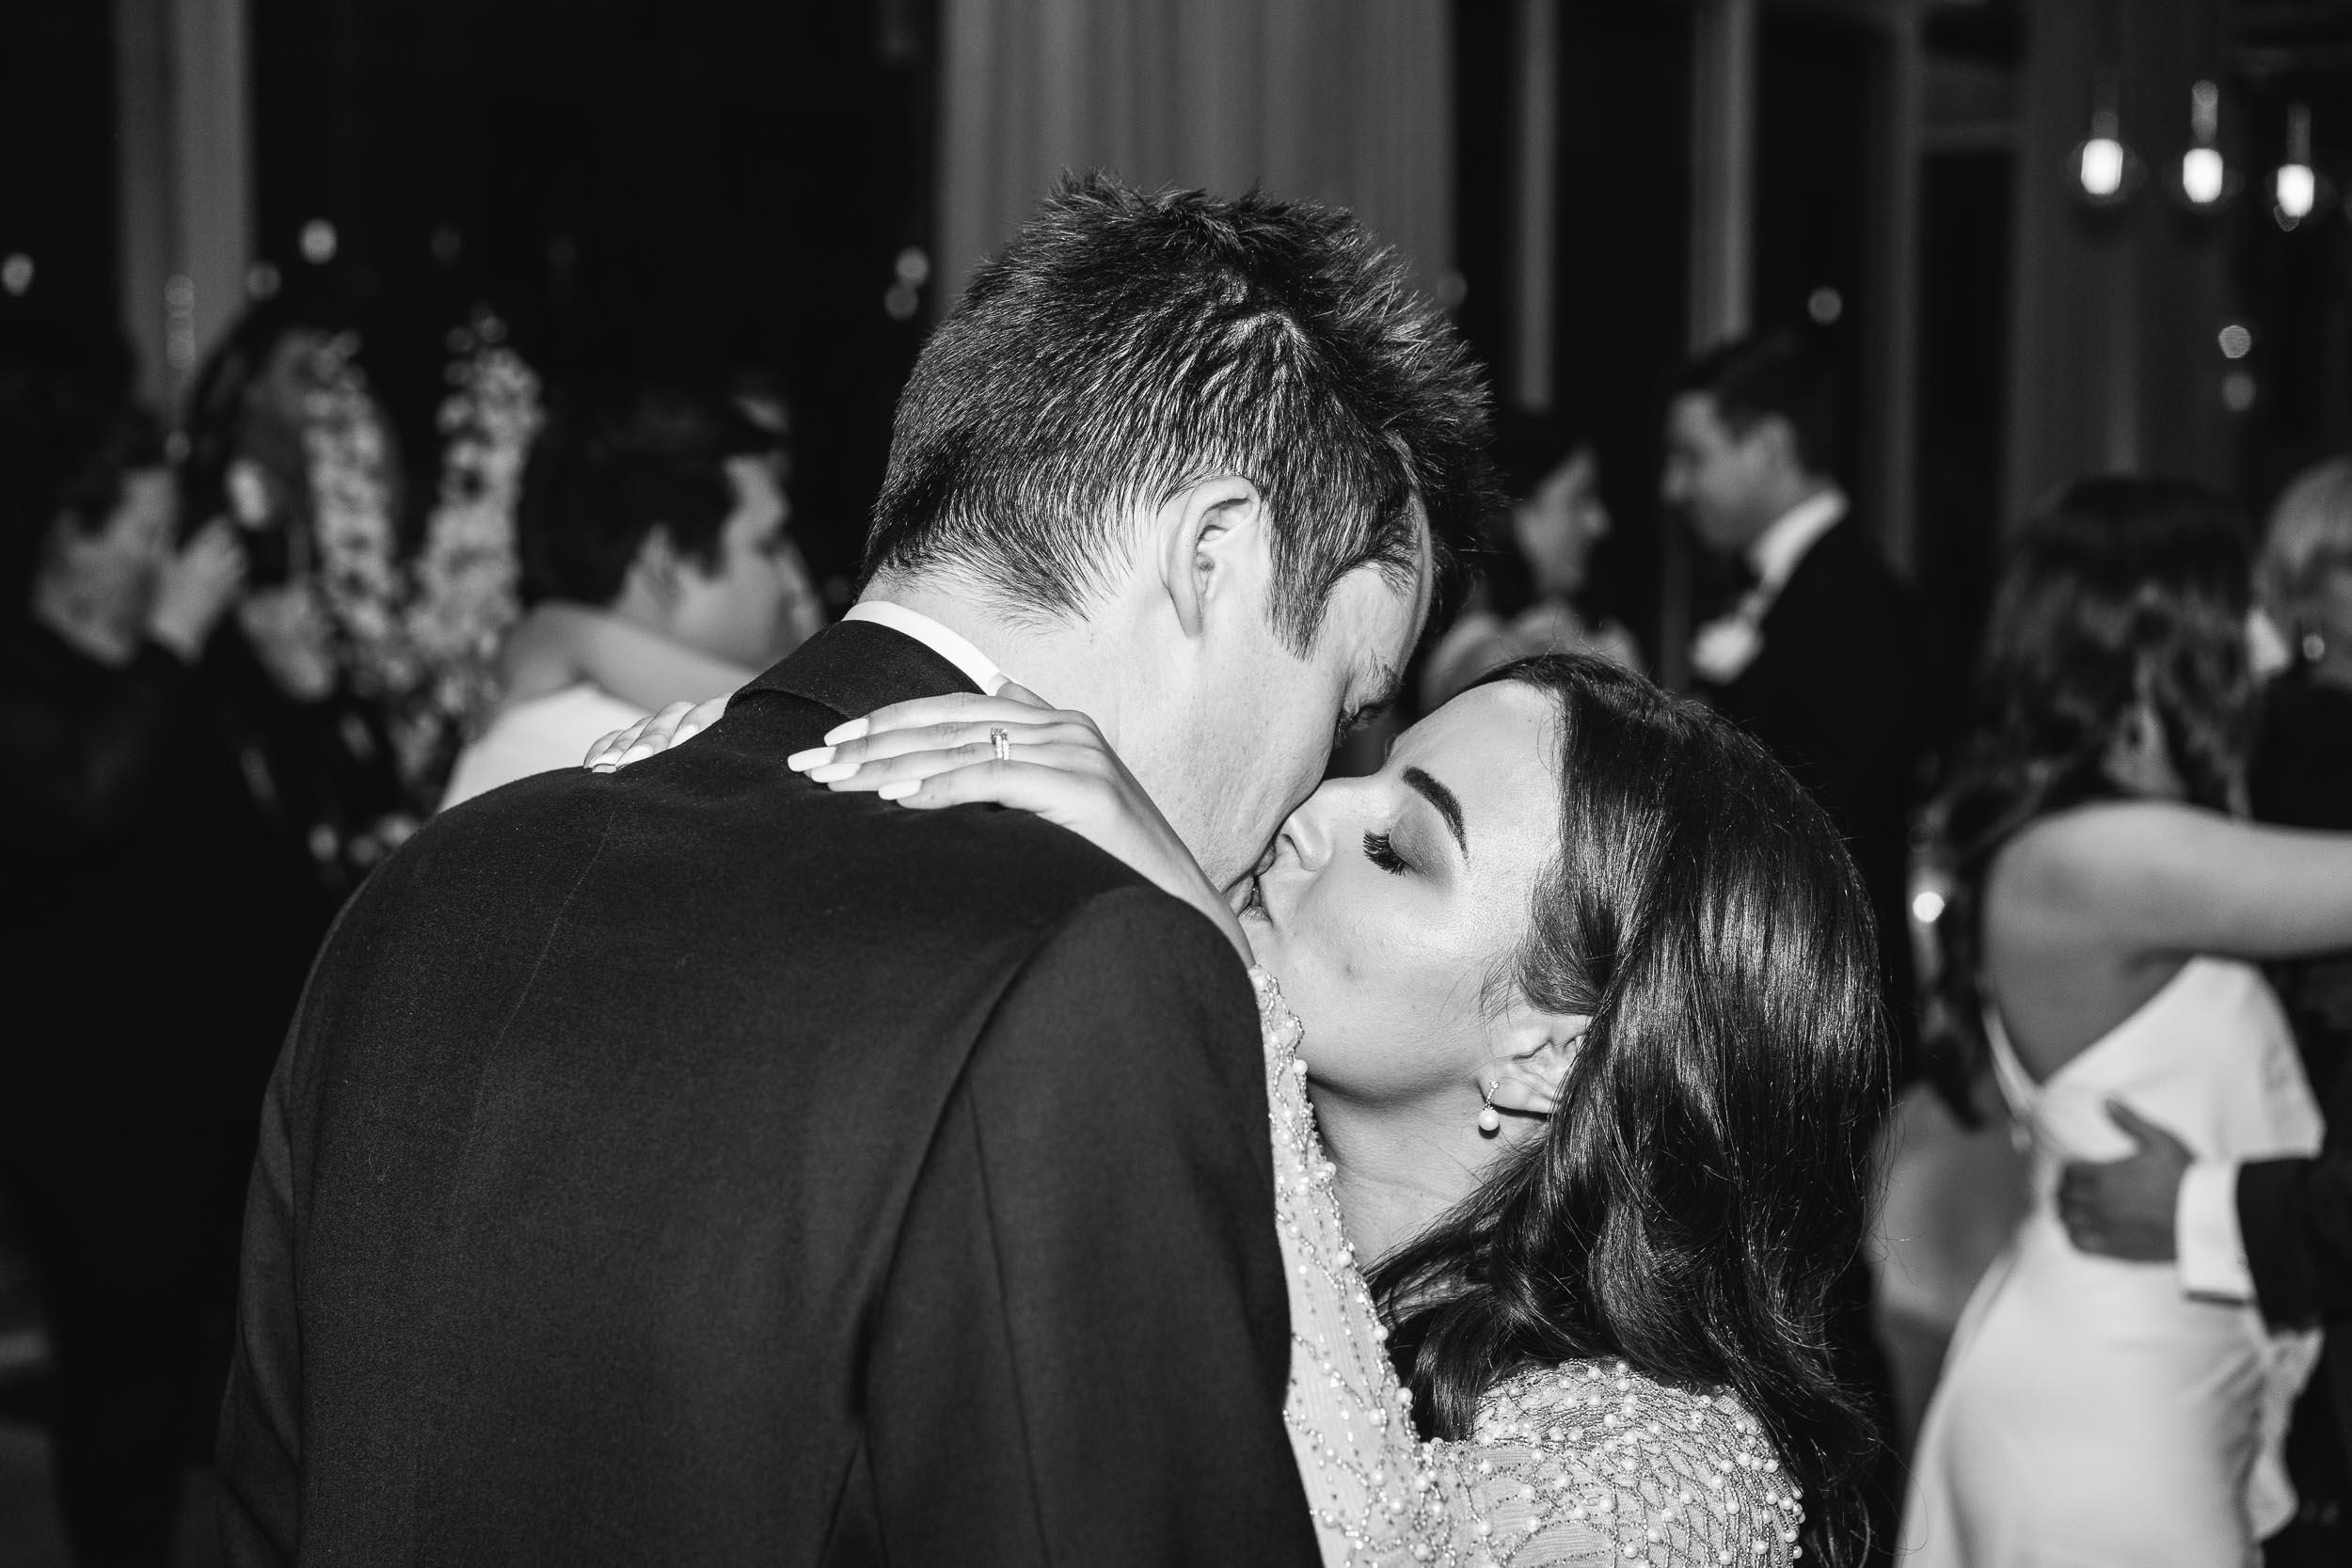 Kas-Richards-Wedding-Photographer-Melbourne-City-Wedding-Alto-Event-Space-Jane-Hill-Bridal-Gown-71.jpg